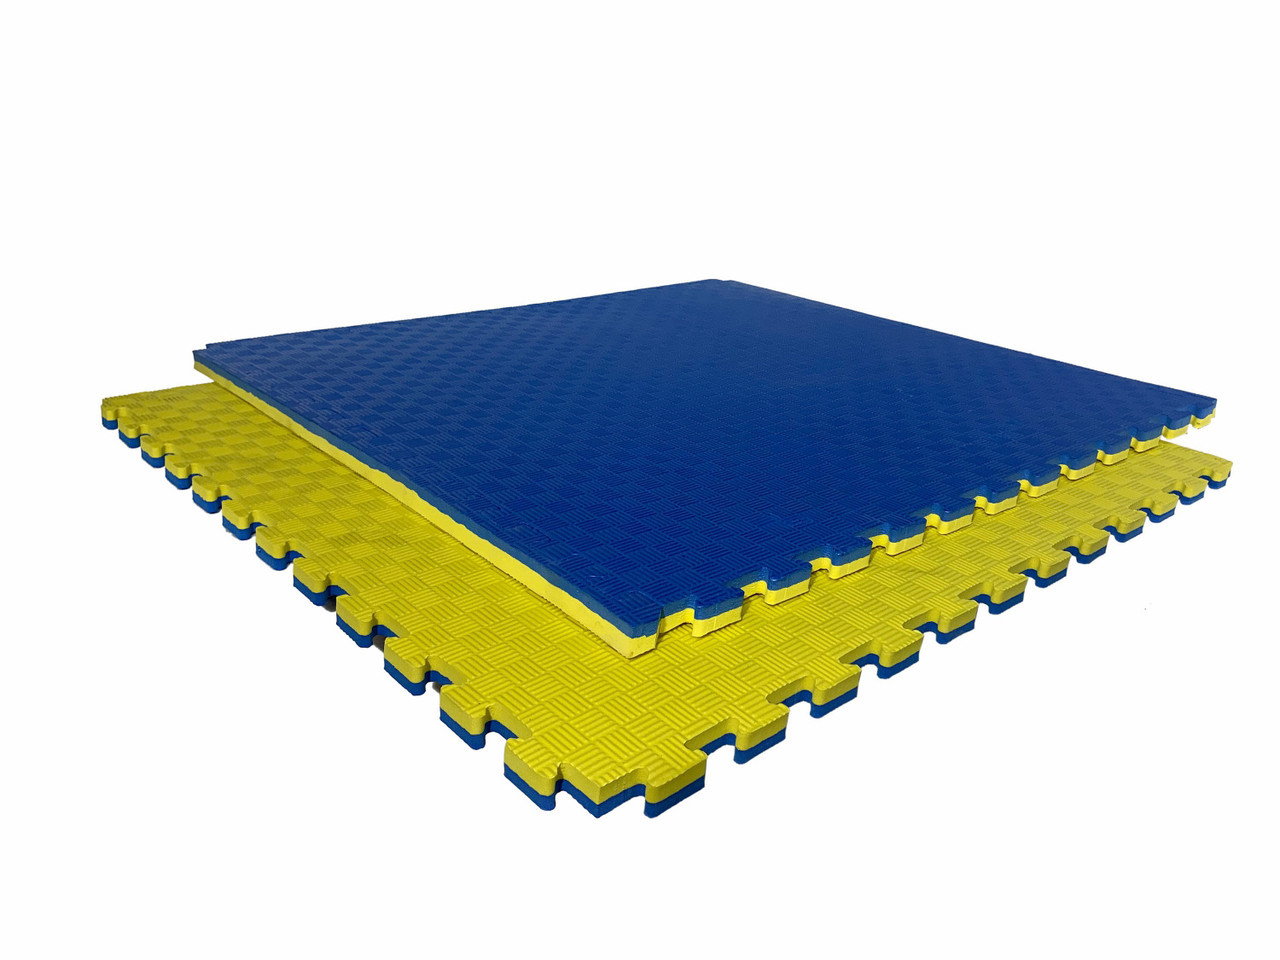 "Мат-татами ласточкин хвост"" 120кг м3 20мм желто-синий Т2"